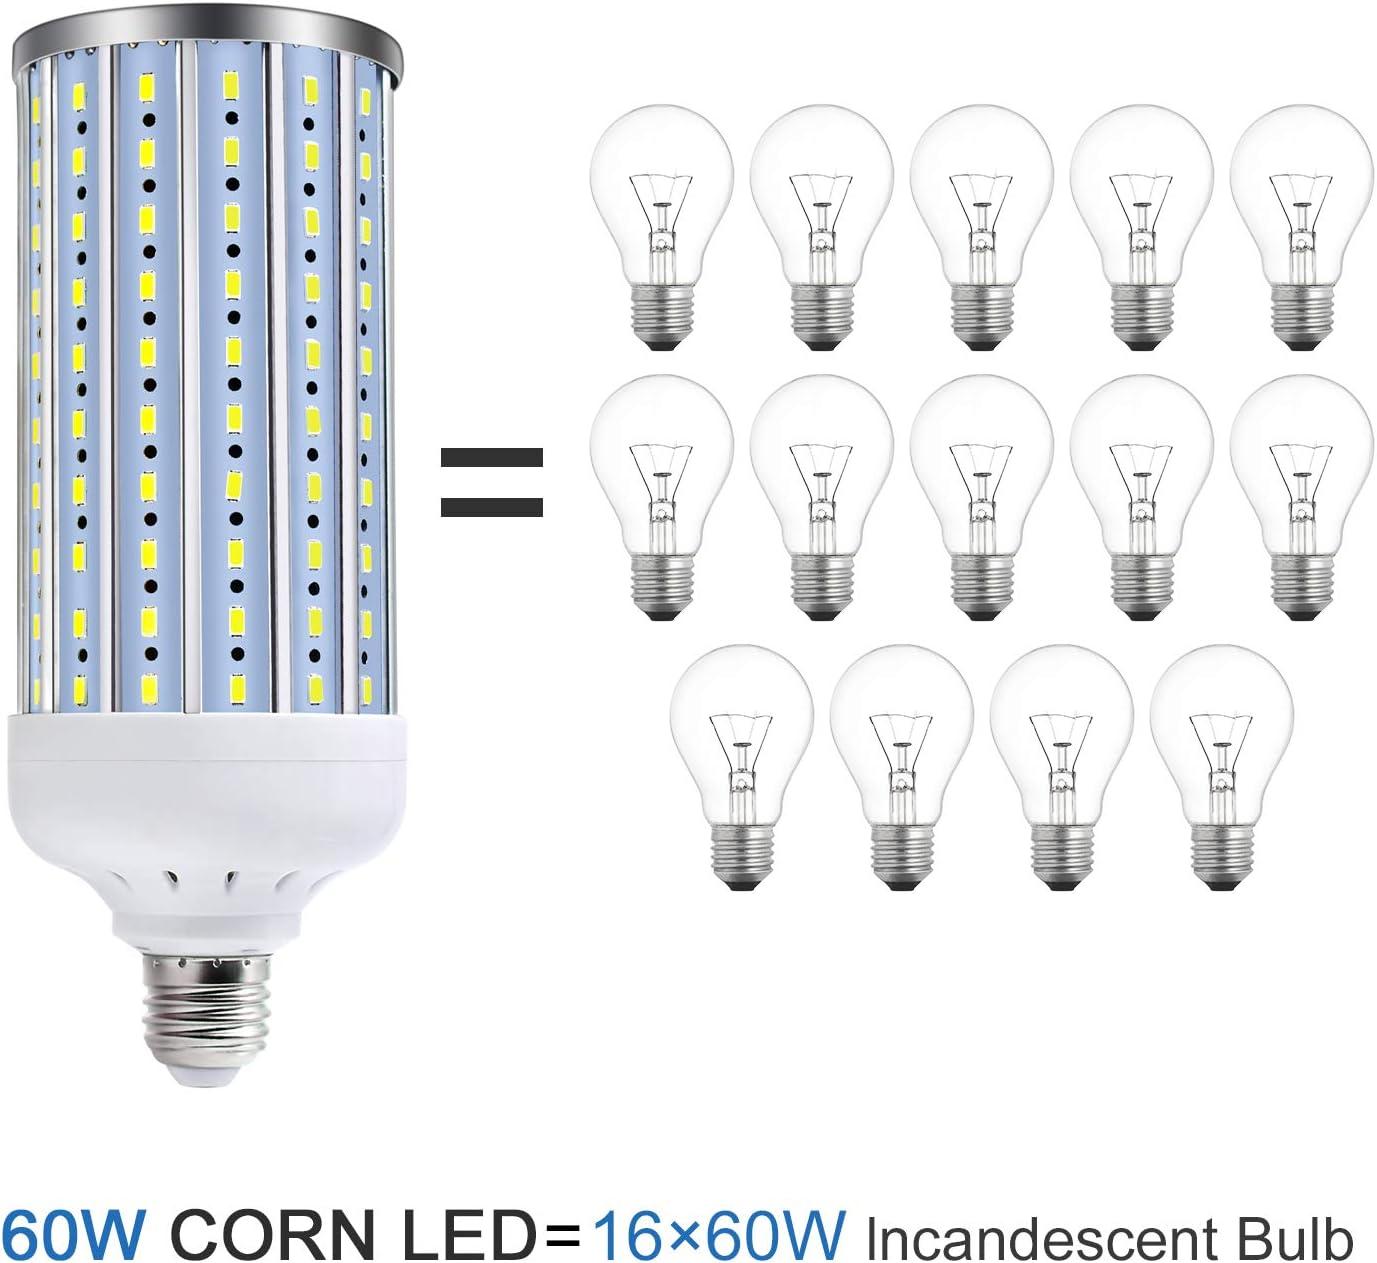 Garage Factory Warehouse Backyard Super Bright 60W for Indoor Outdoor Large Area Lighting Basement. 6500K Daylight White LED Corn Light Bulb 500W Equivalent 5500Lumen E26//E27 Medium Base